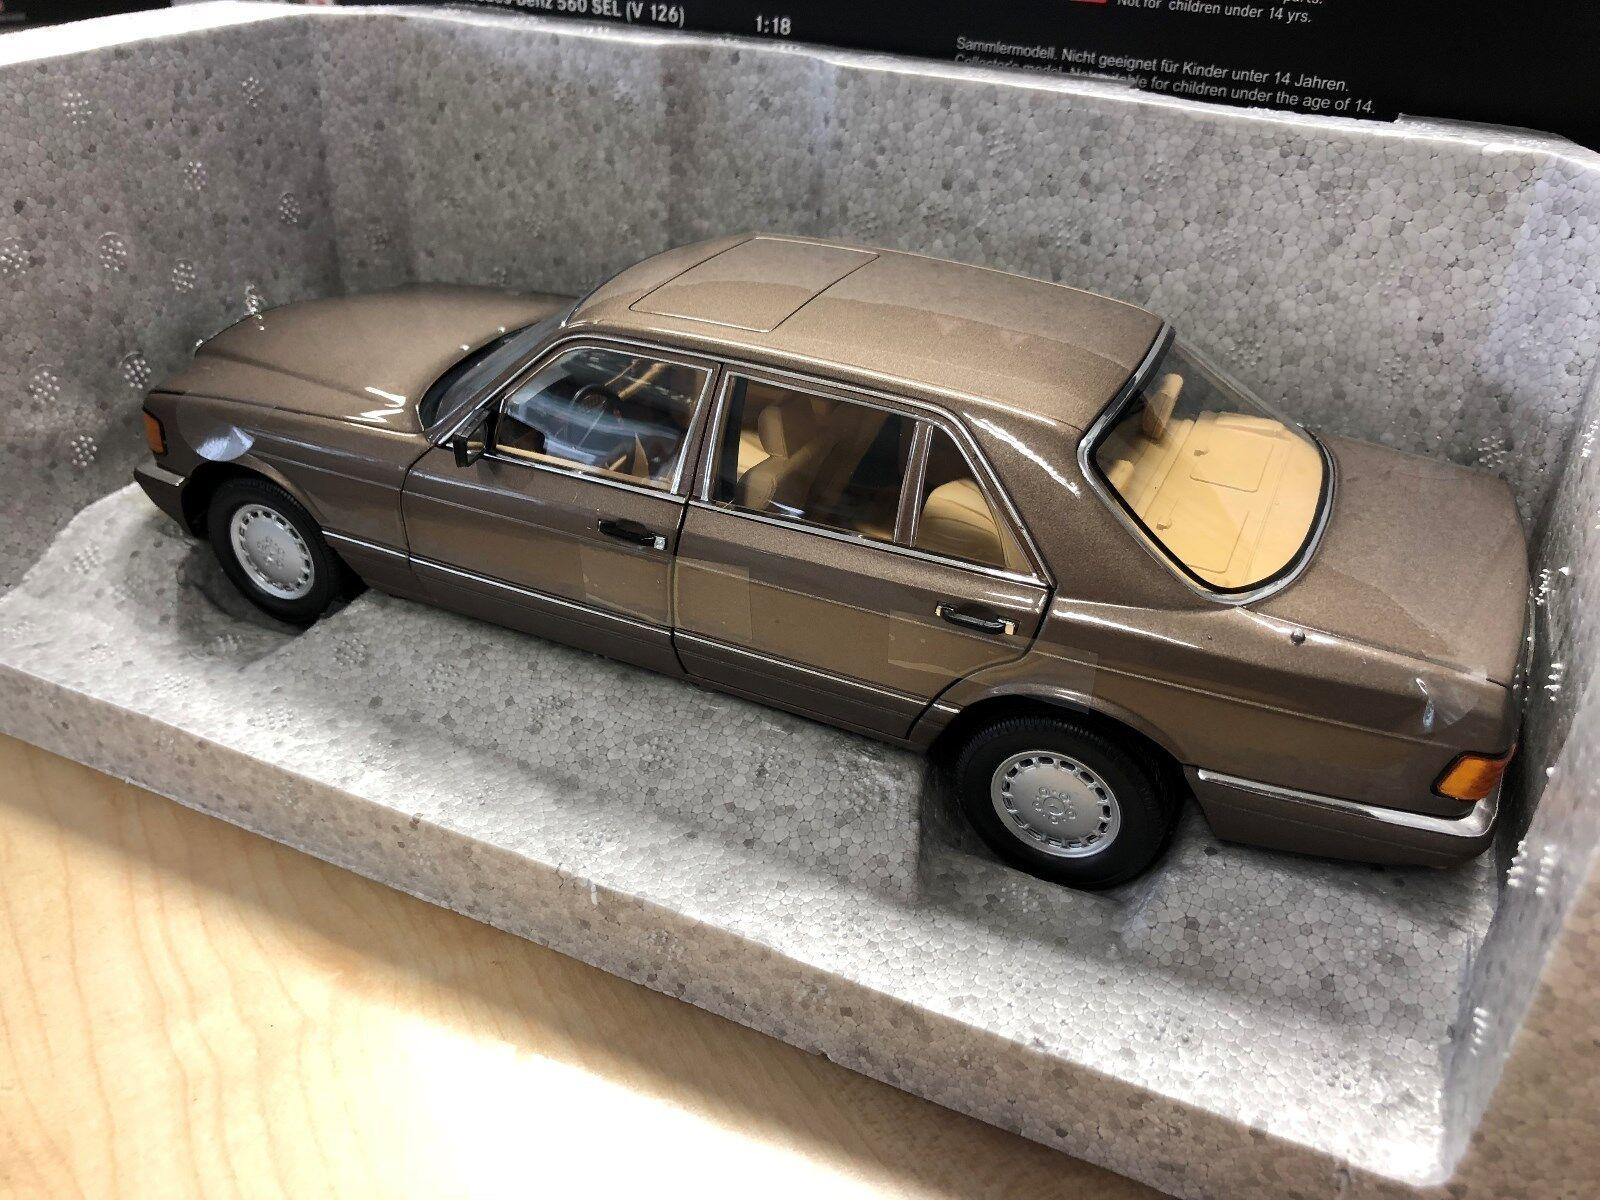 Mercedes Benz, 560 SEL, W126, 1985-1991, 1 18 Modelauto, Impala braun, Norev